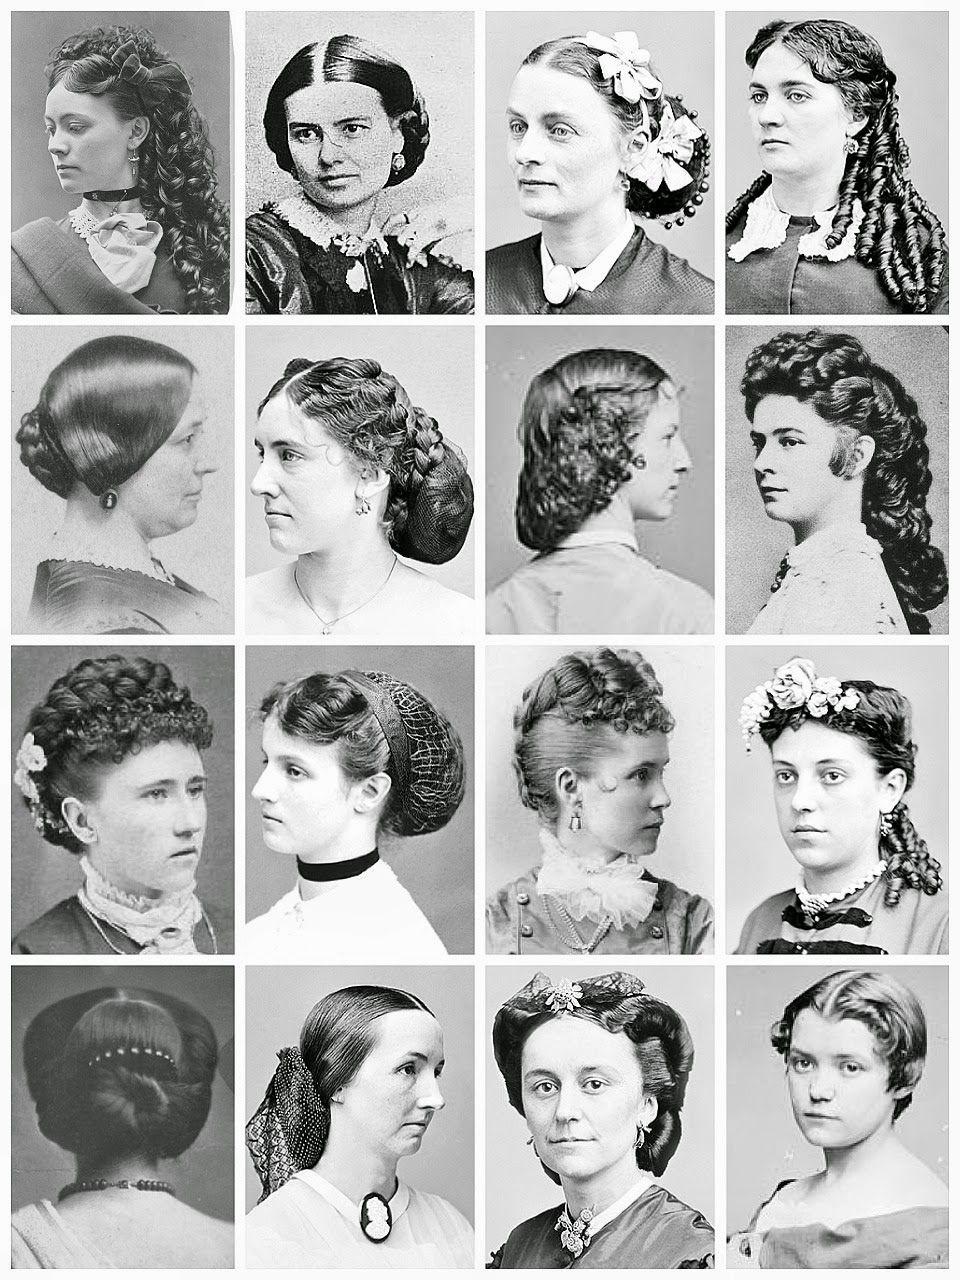 civil war short hair women - Yahoo Image Search Results